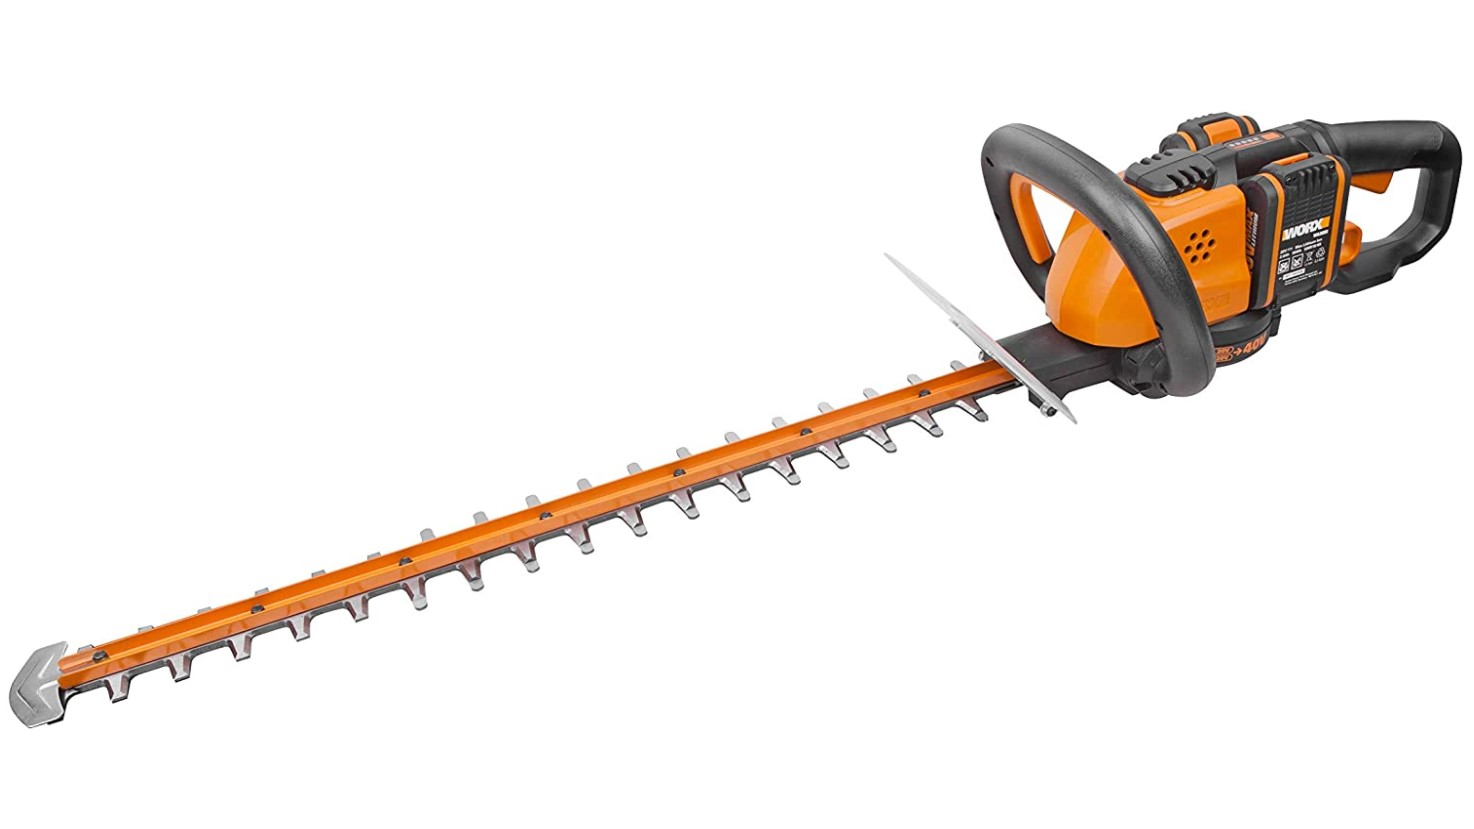 20V MAX Cordless 46cm Hedge Trimmer with 2 Batteries WORX WG261E.1 18V